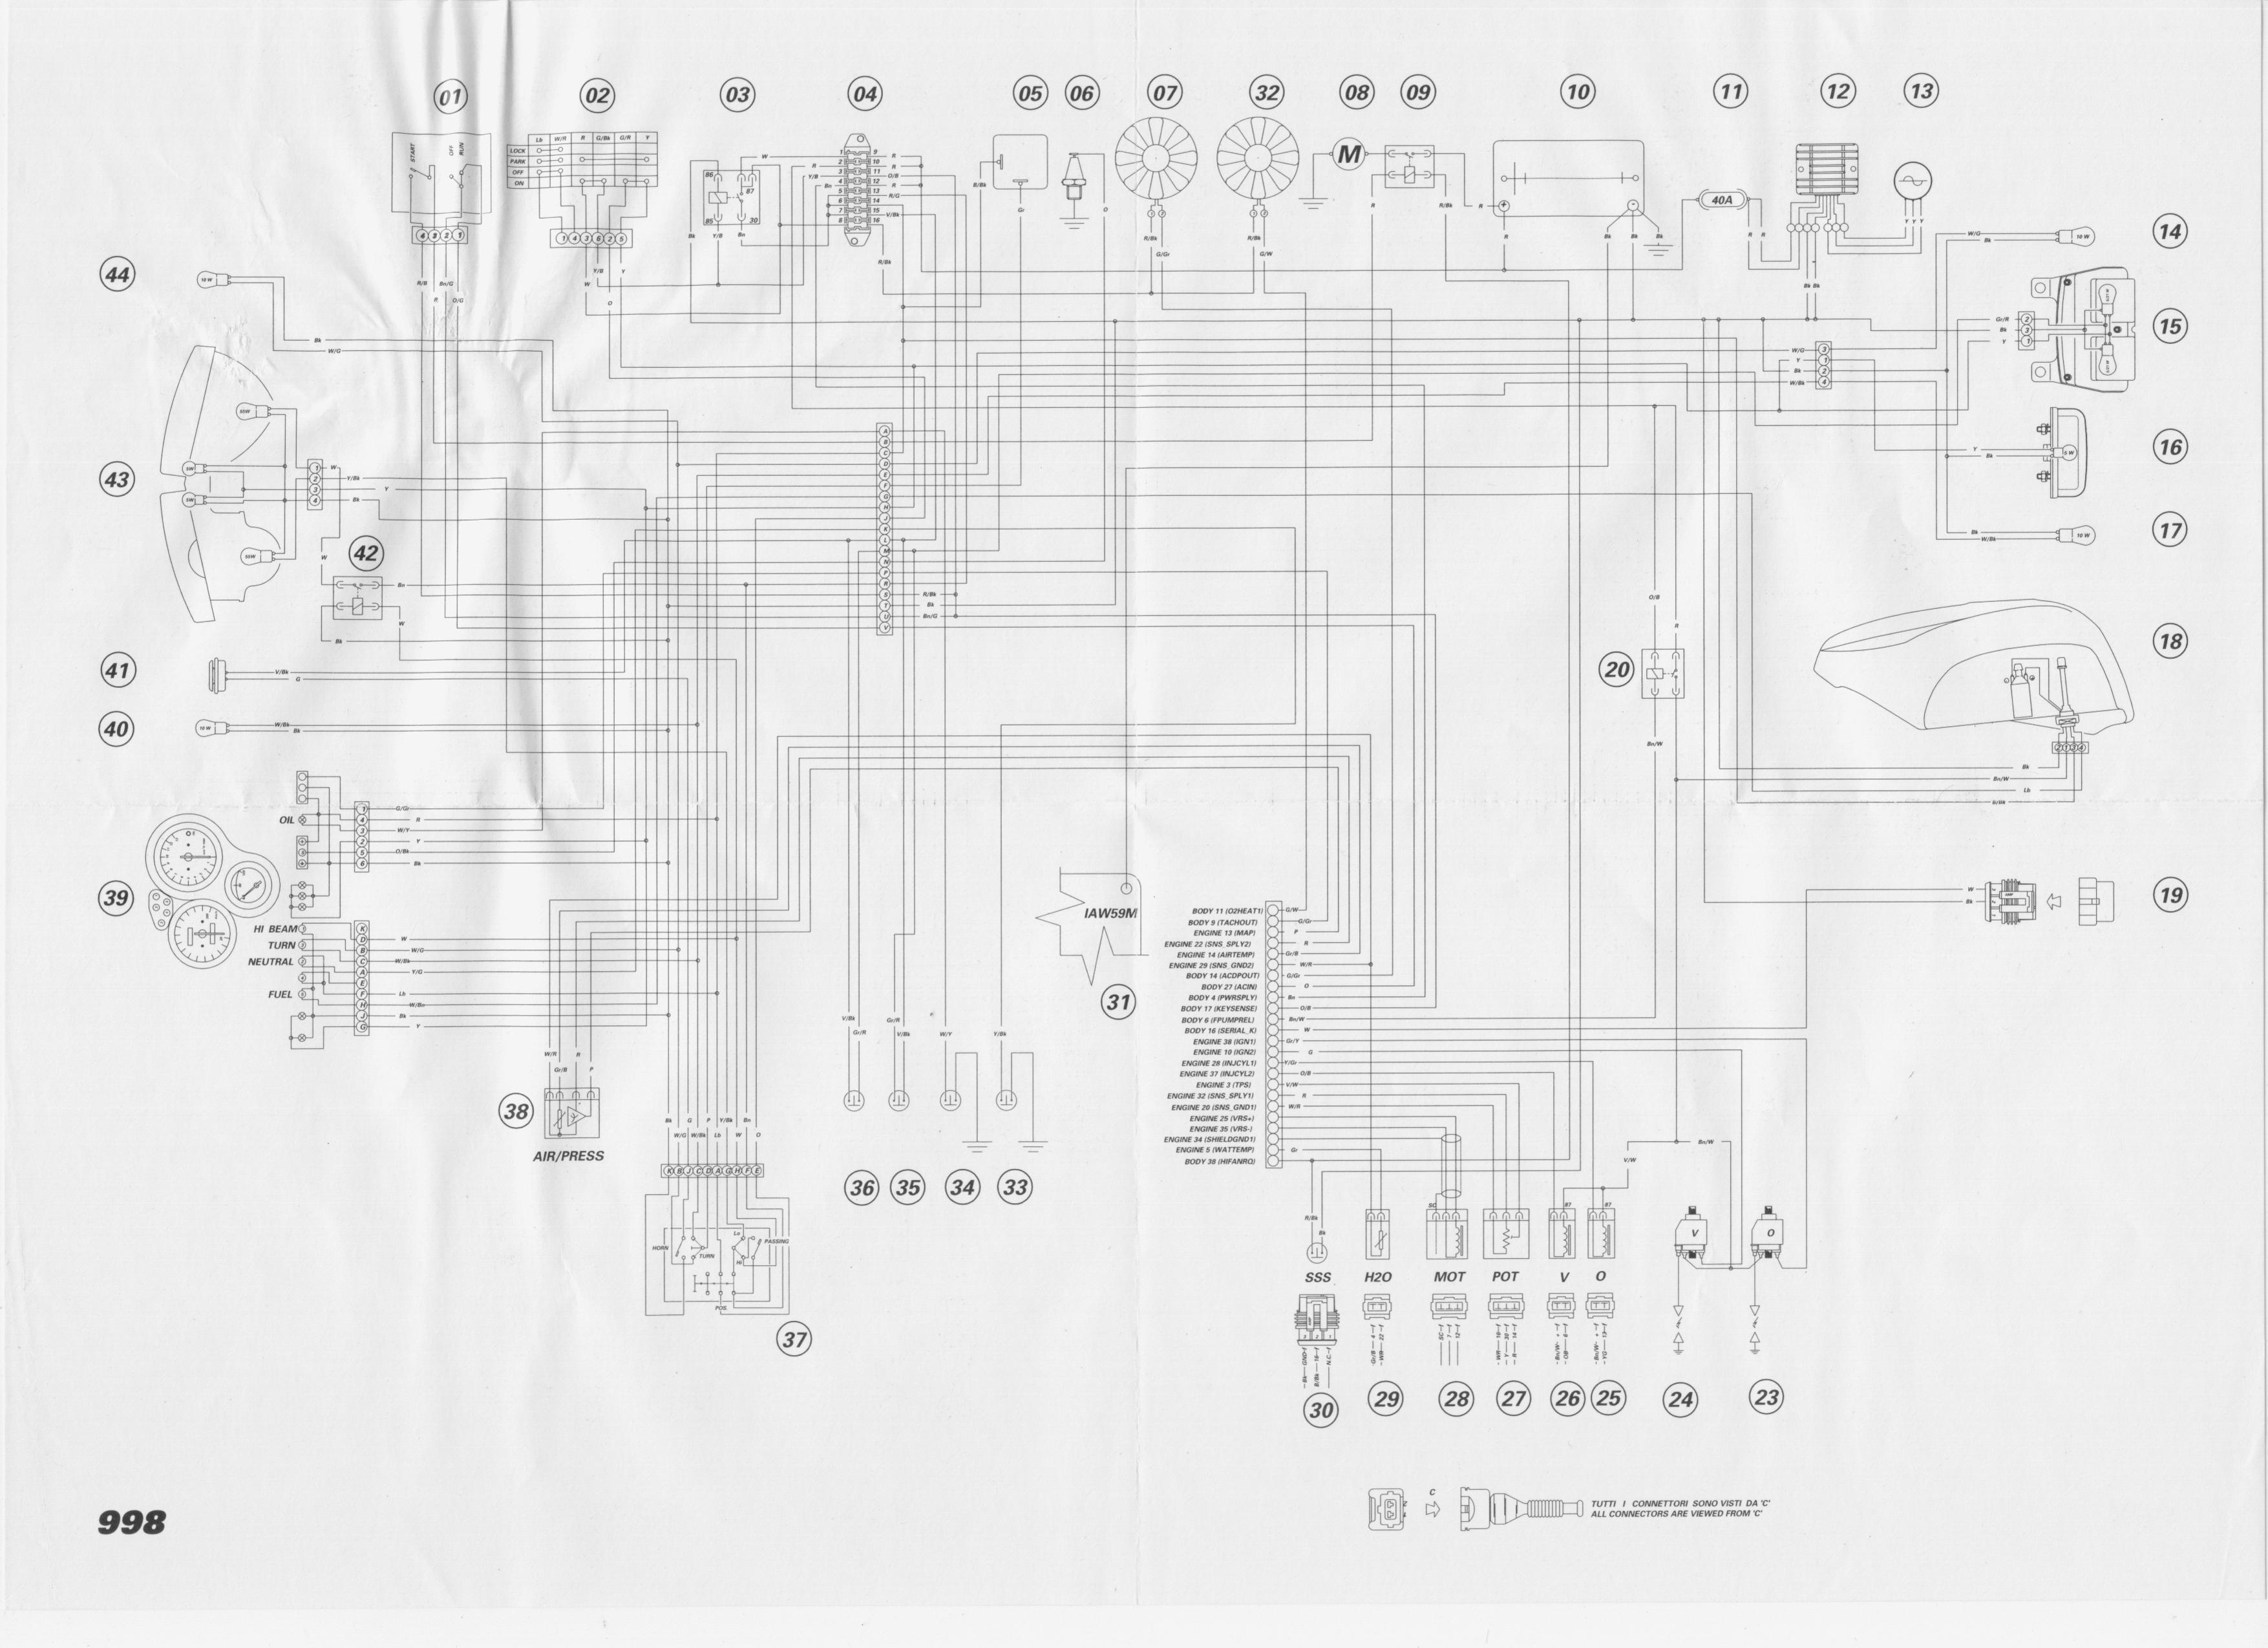 [BR_3705] Ducati M900 Wiring Diagram Wiring Diagram